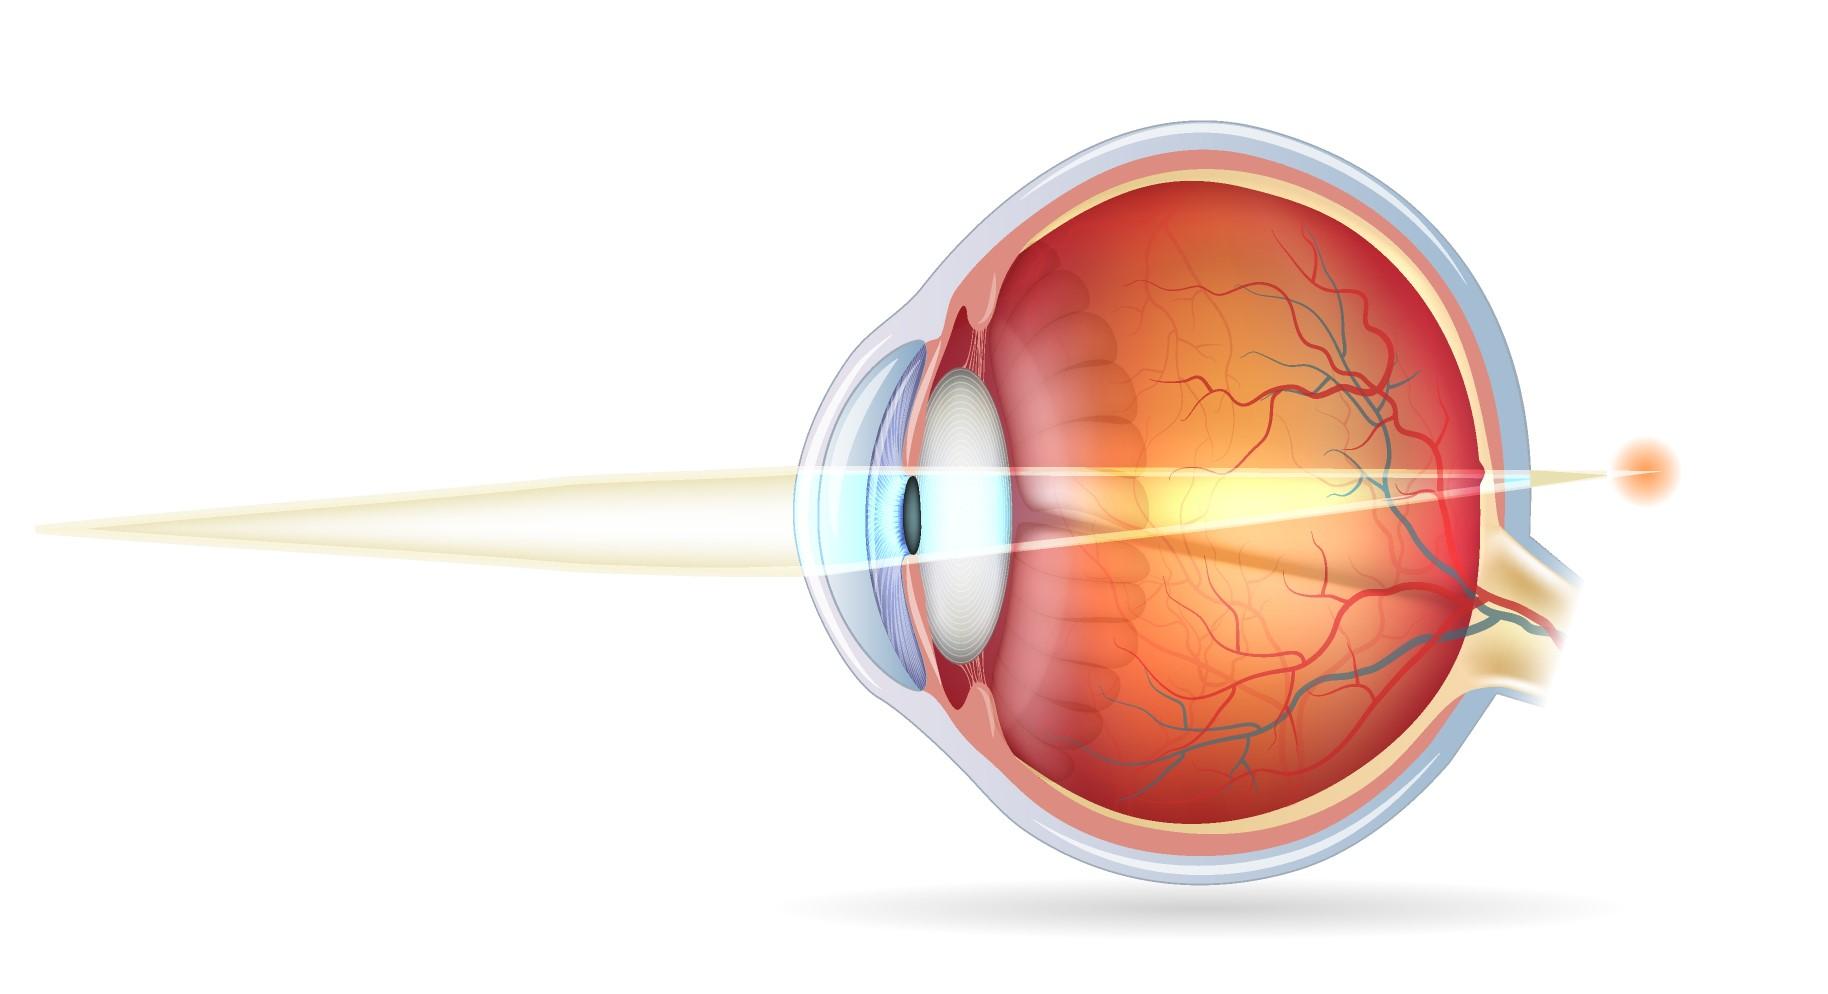 217d32bc9d Hipermetropía - Enfermedades de los ojos - Vissum